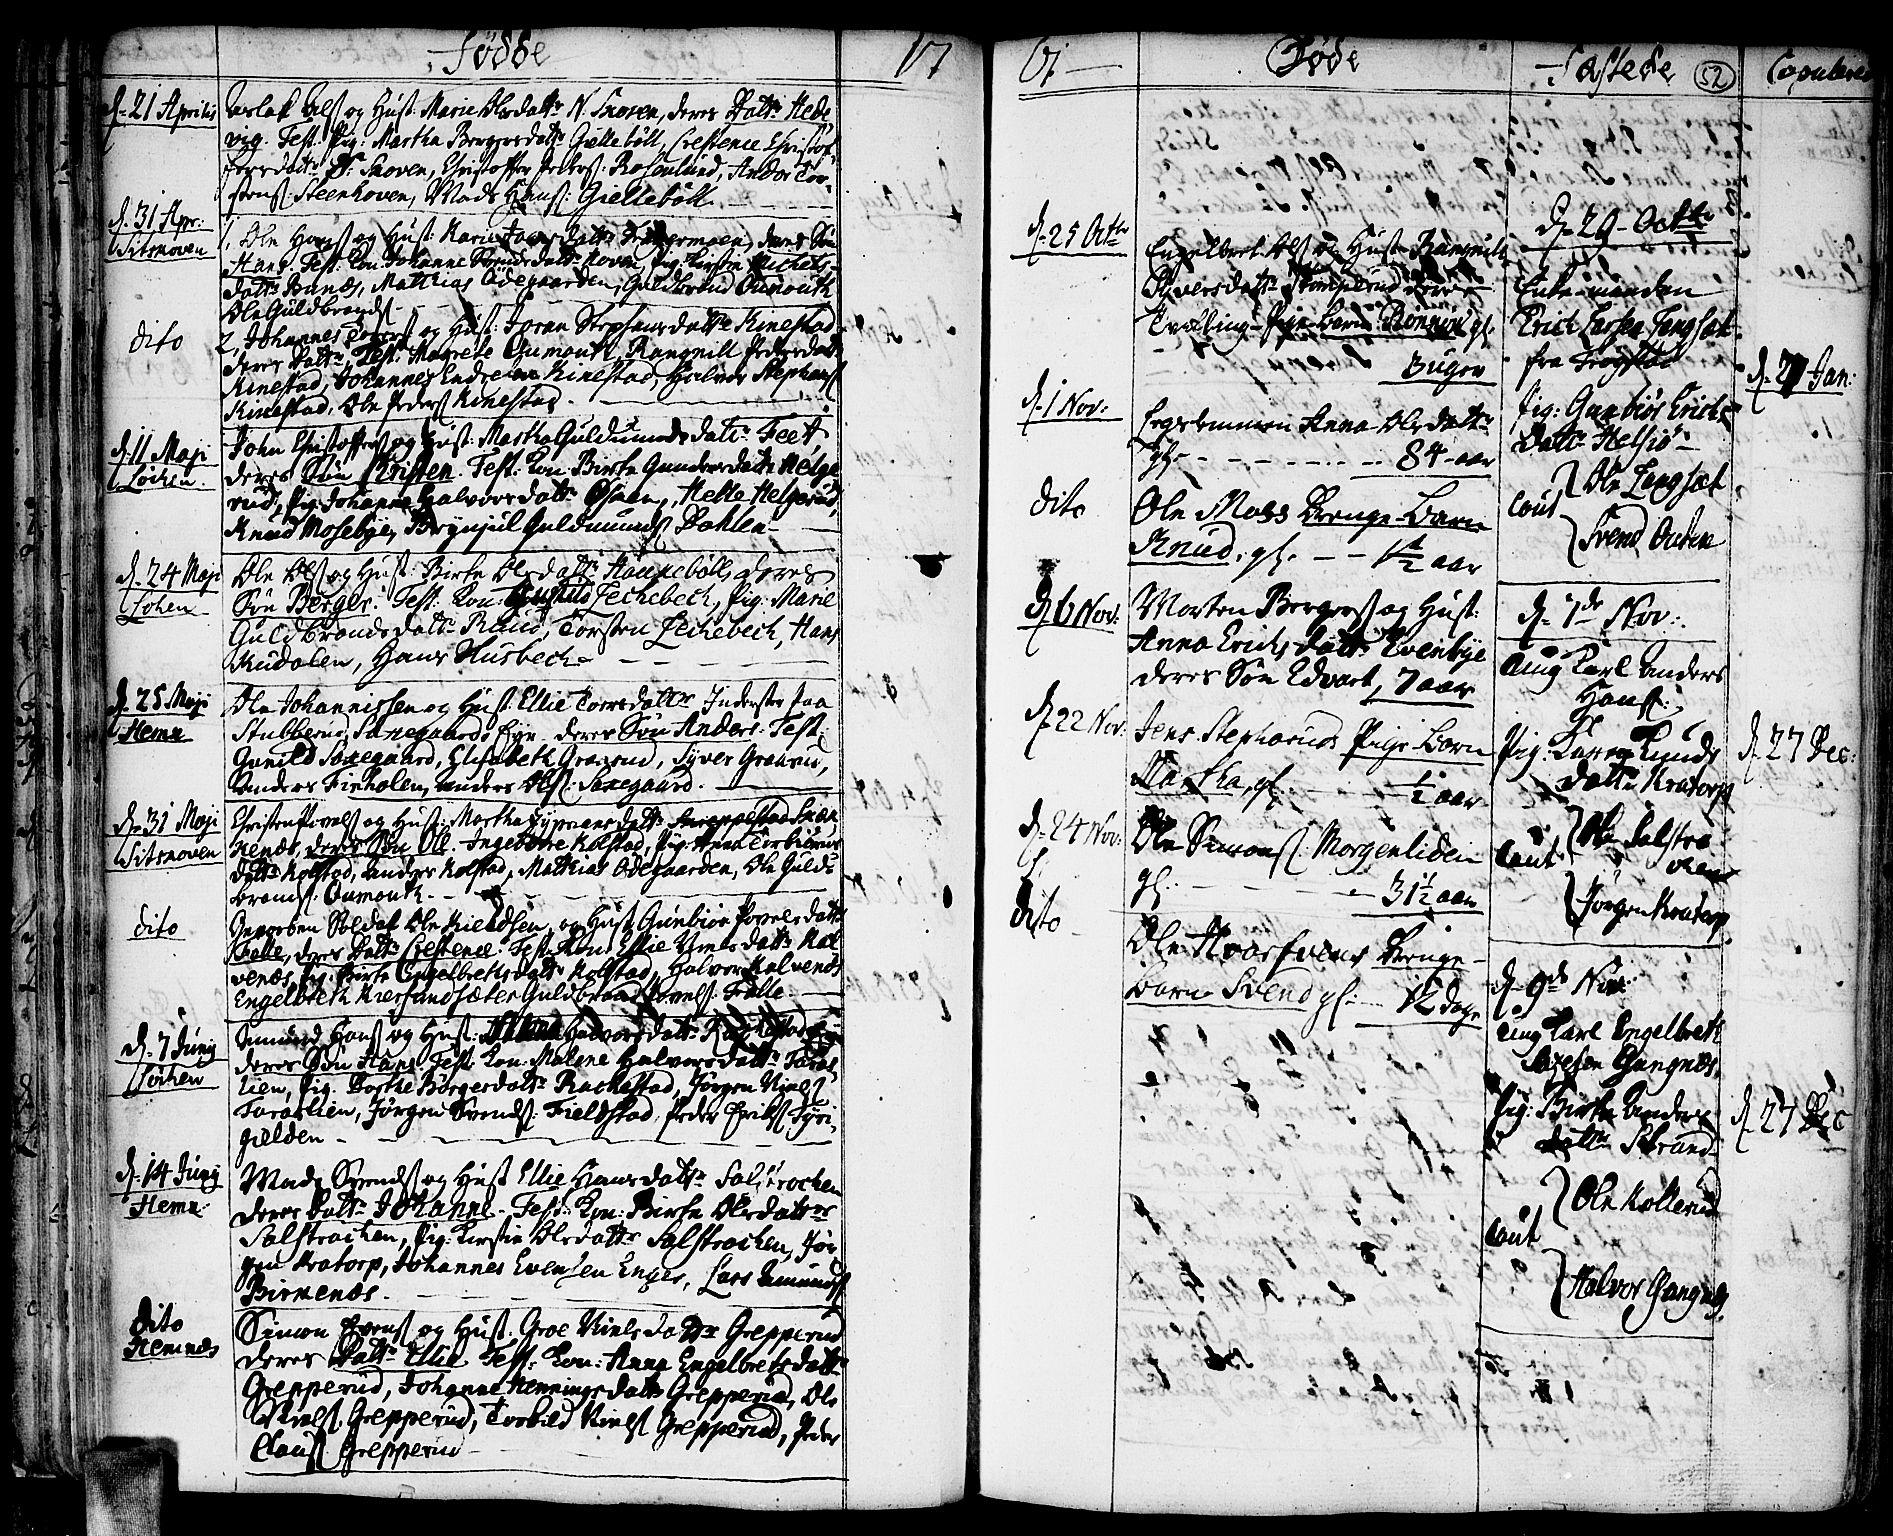 SAO, Høland prestekontor Kirkebøker, F/Fa/L0004: Ministerialbok nr. I 4, 1757-1780, s. 52